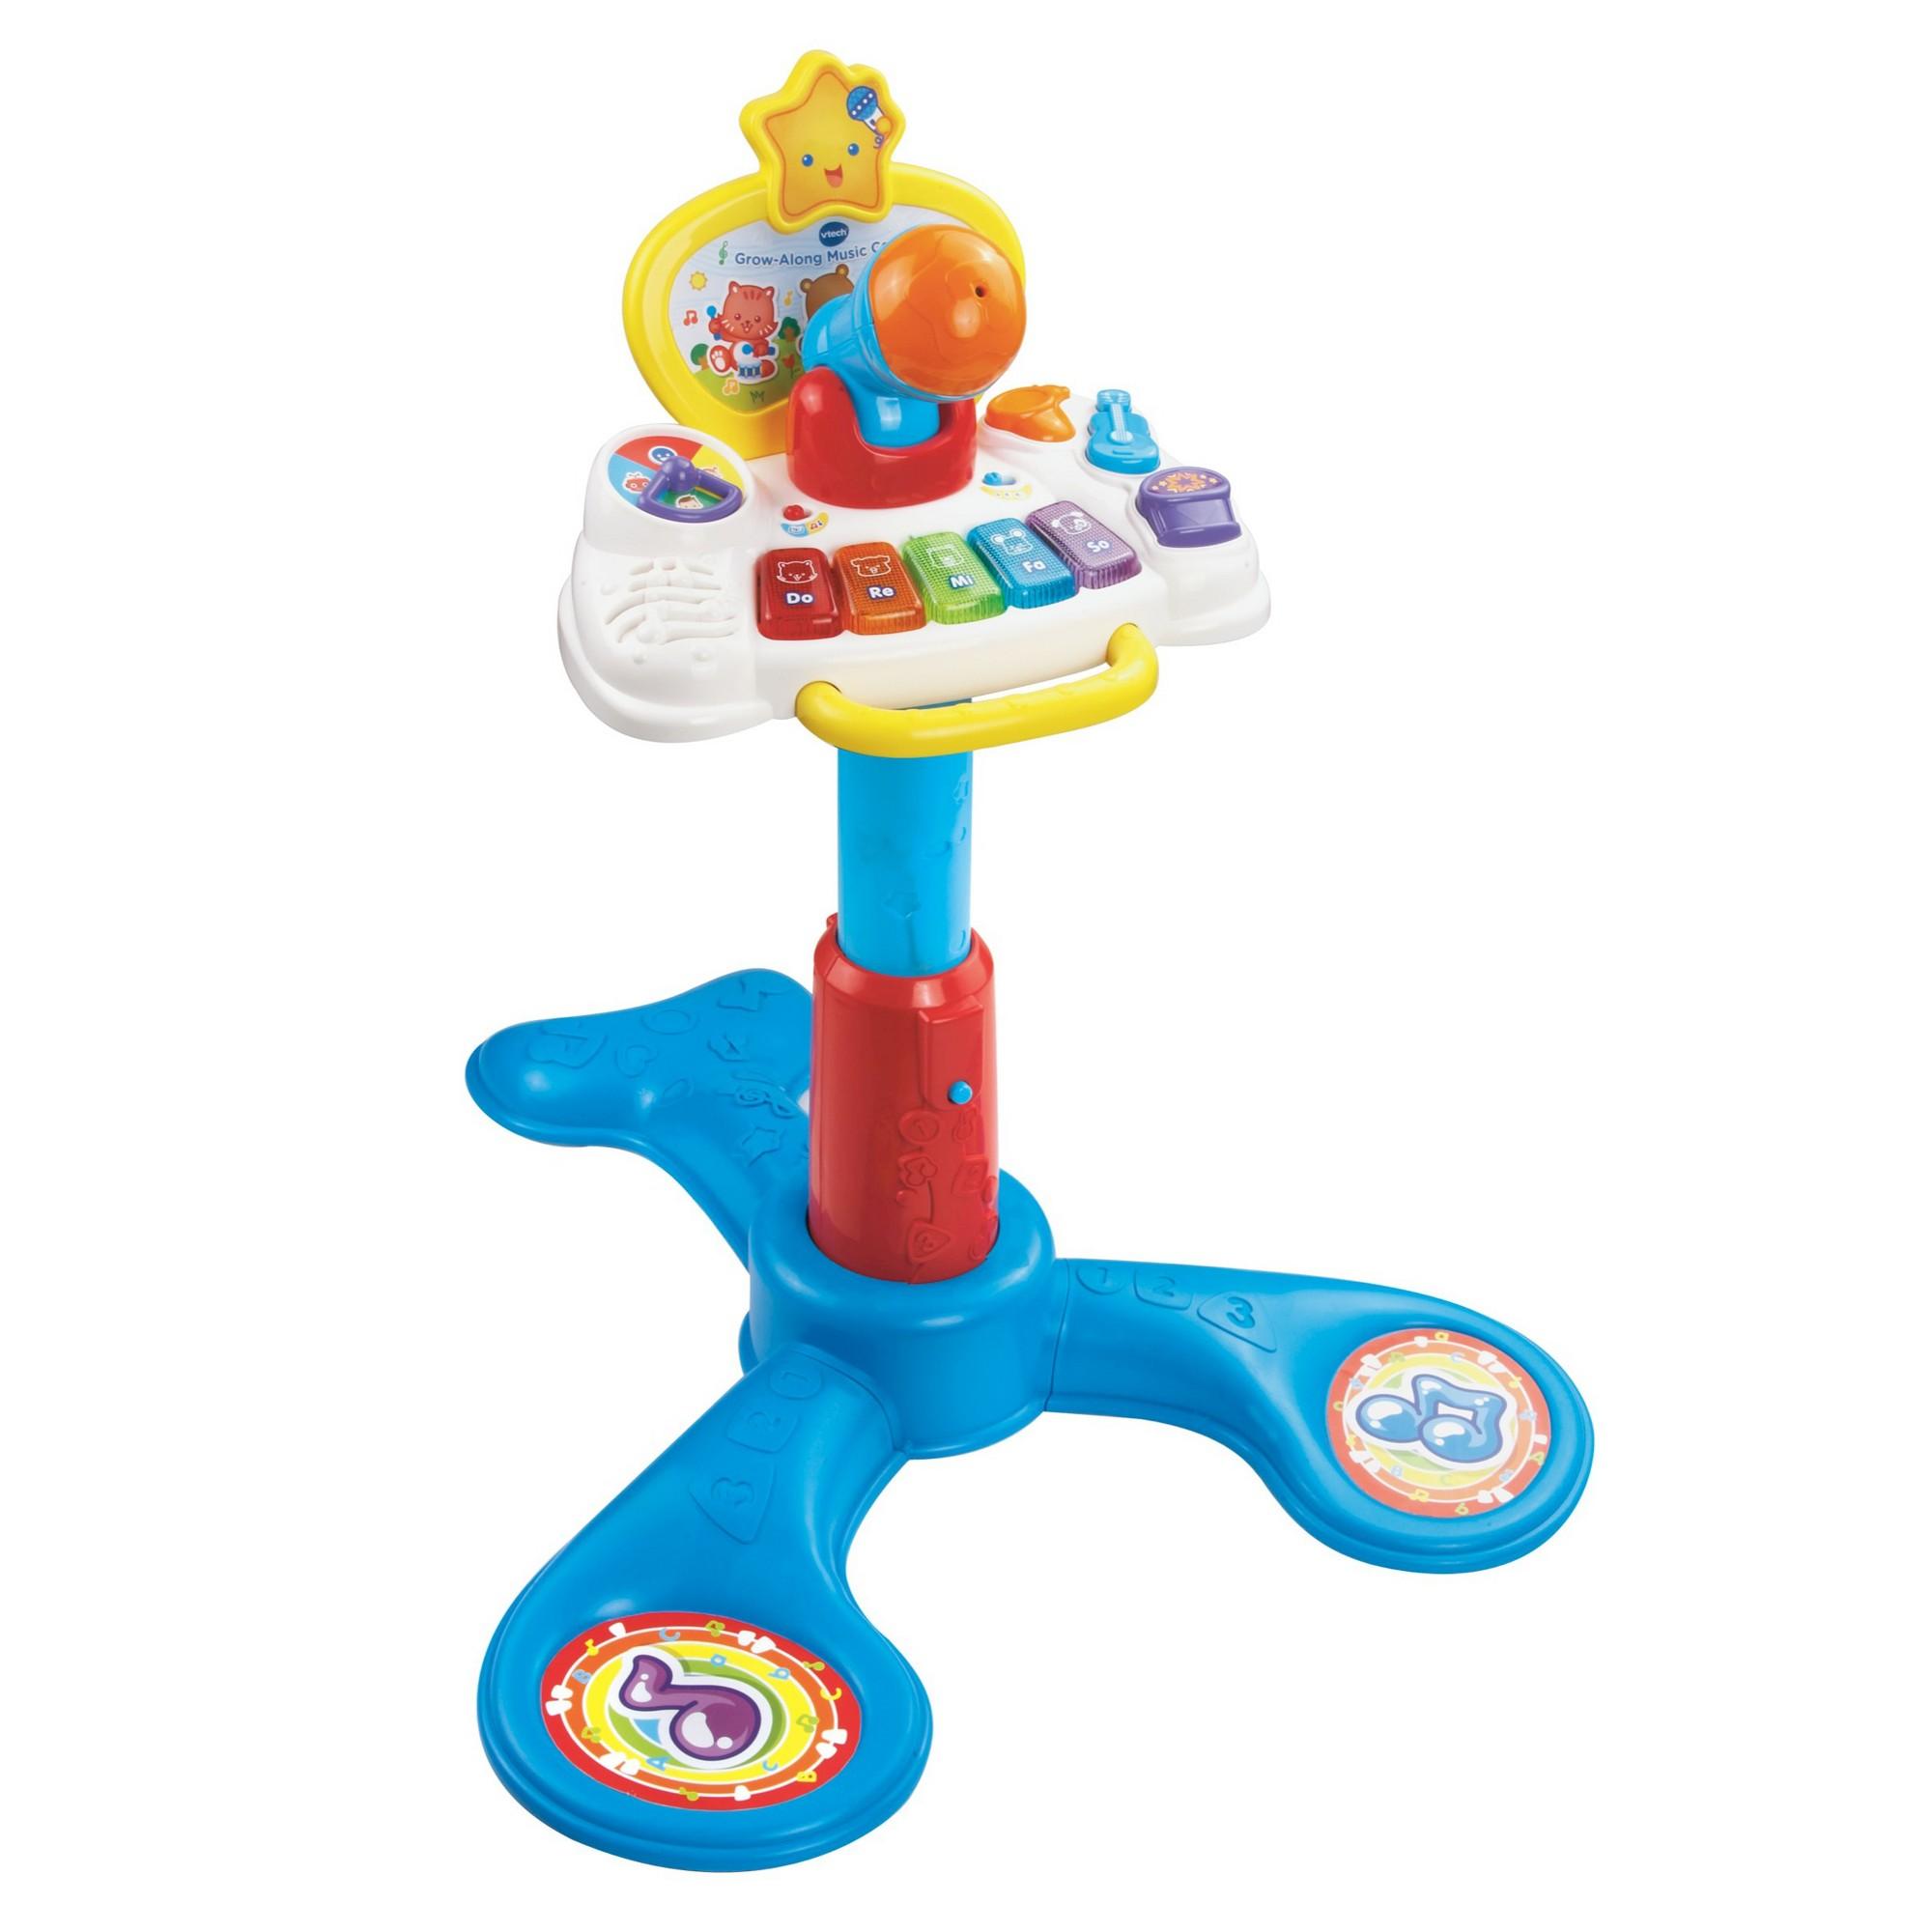 VTech GrowAlong Music Center Toys for 1 year old, Learn